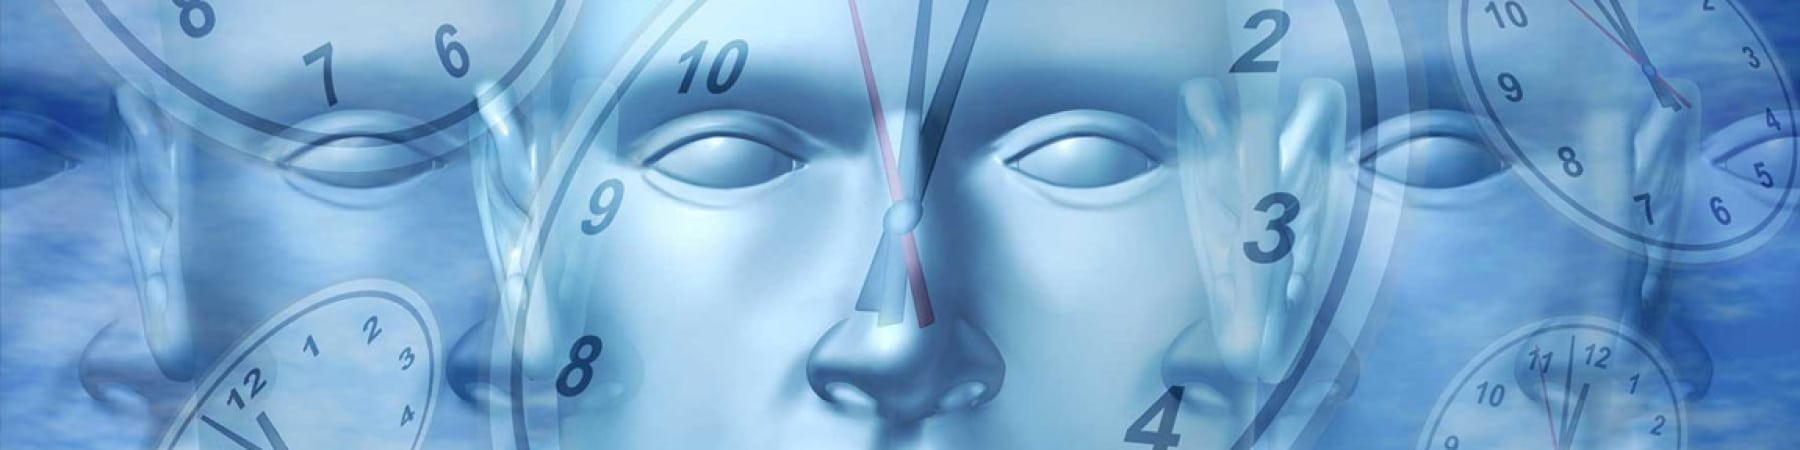 Chronotherapy: Harmonizing Disease Treatment with Internal Body Clocks